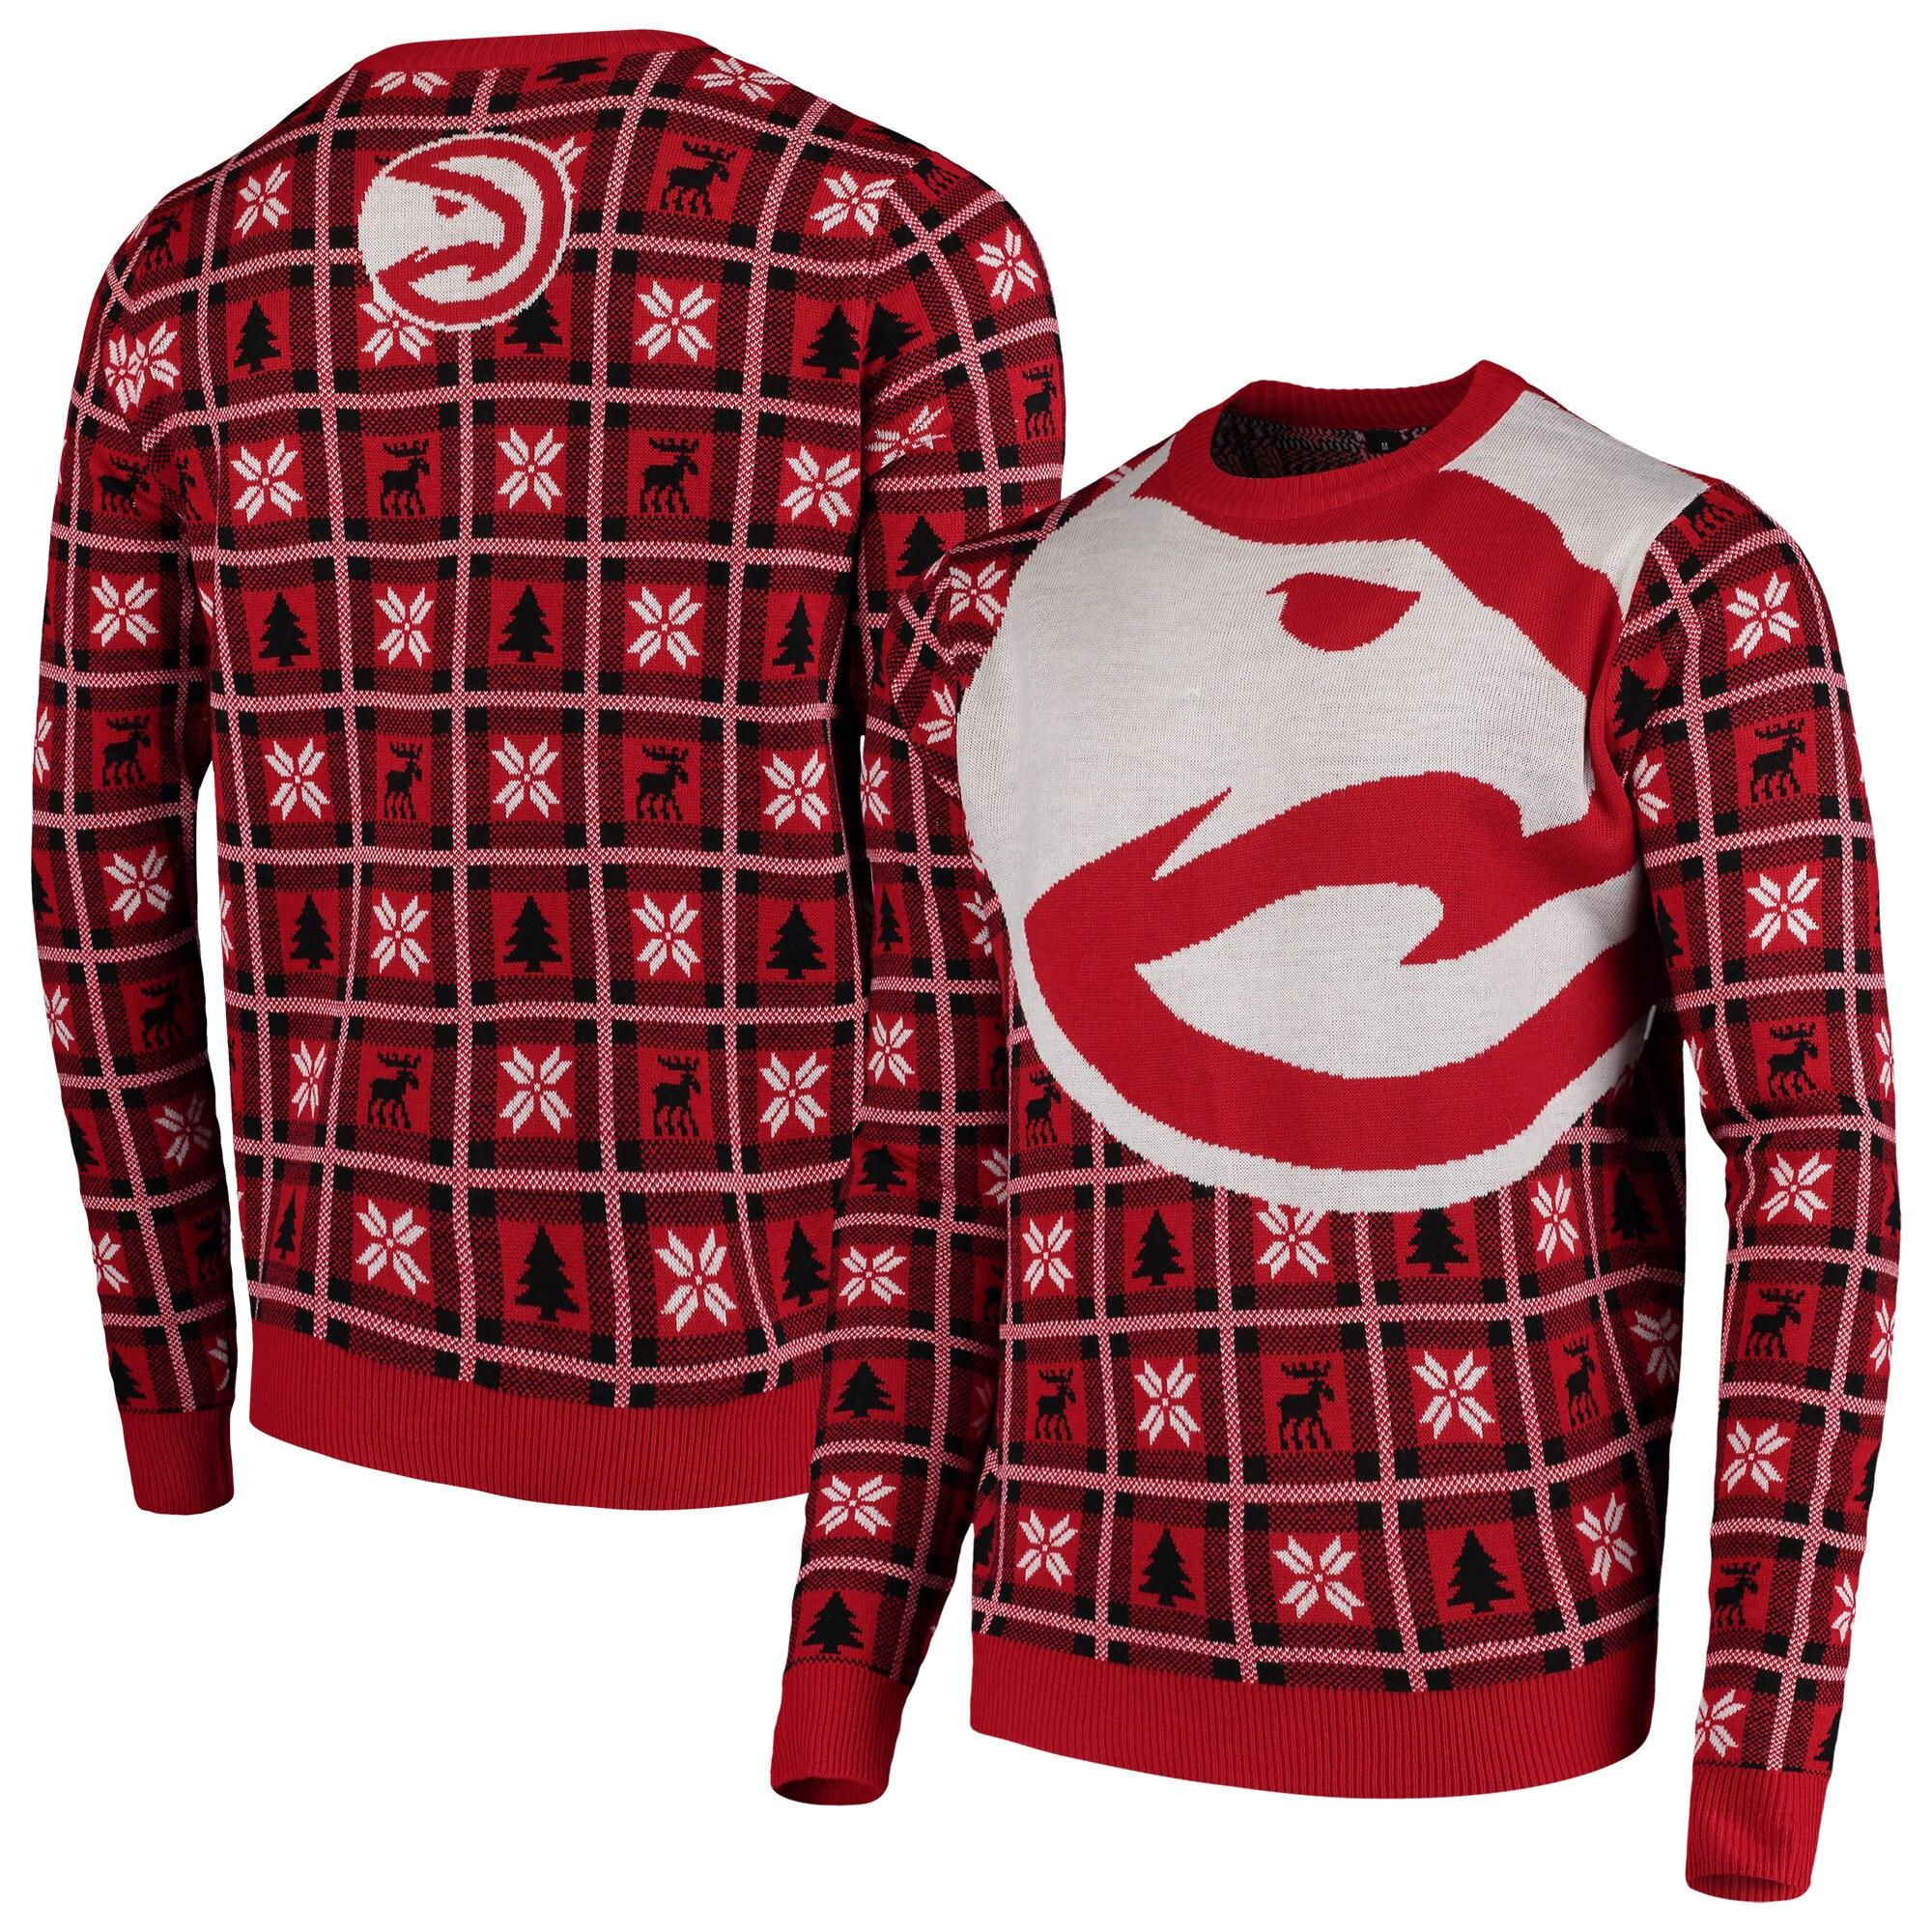 Atlanta Hawks Big Logo Ugly Sweater - Red